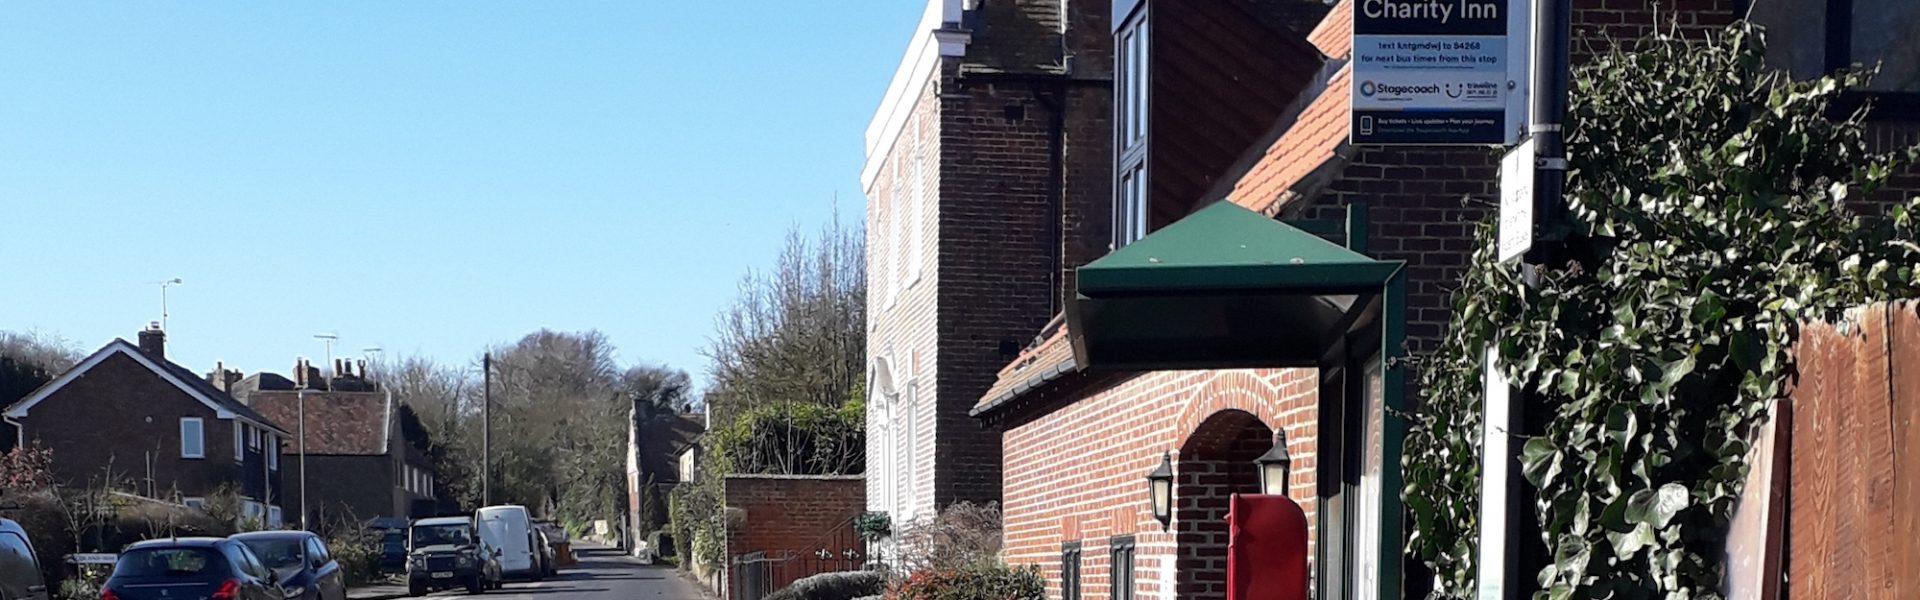 Woodnesborough Parish Council